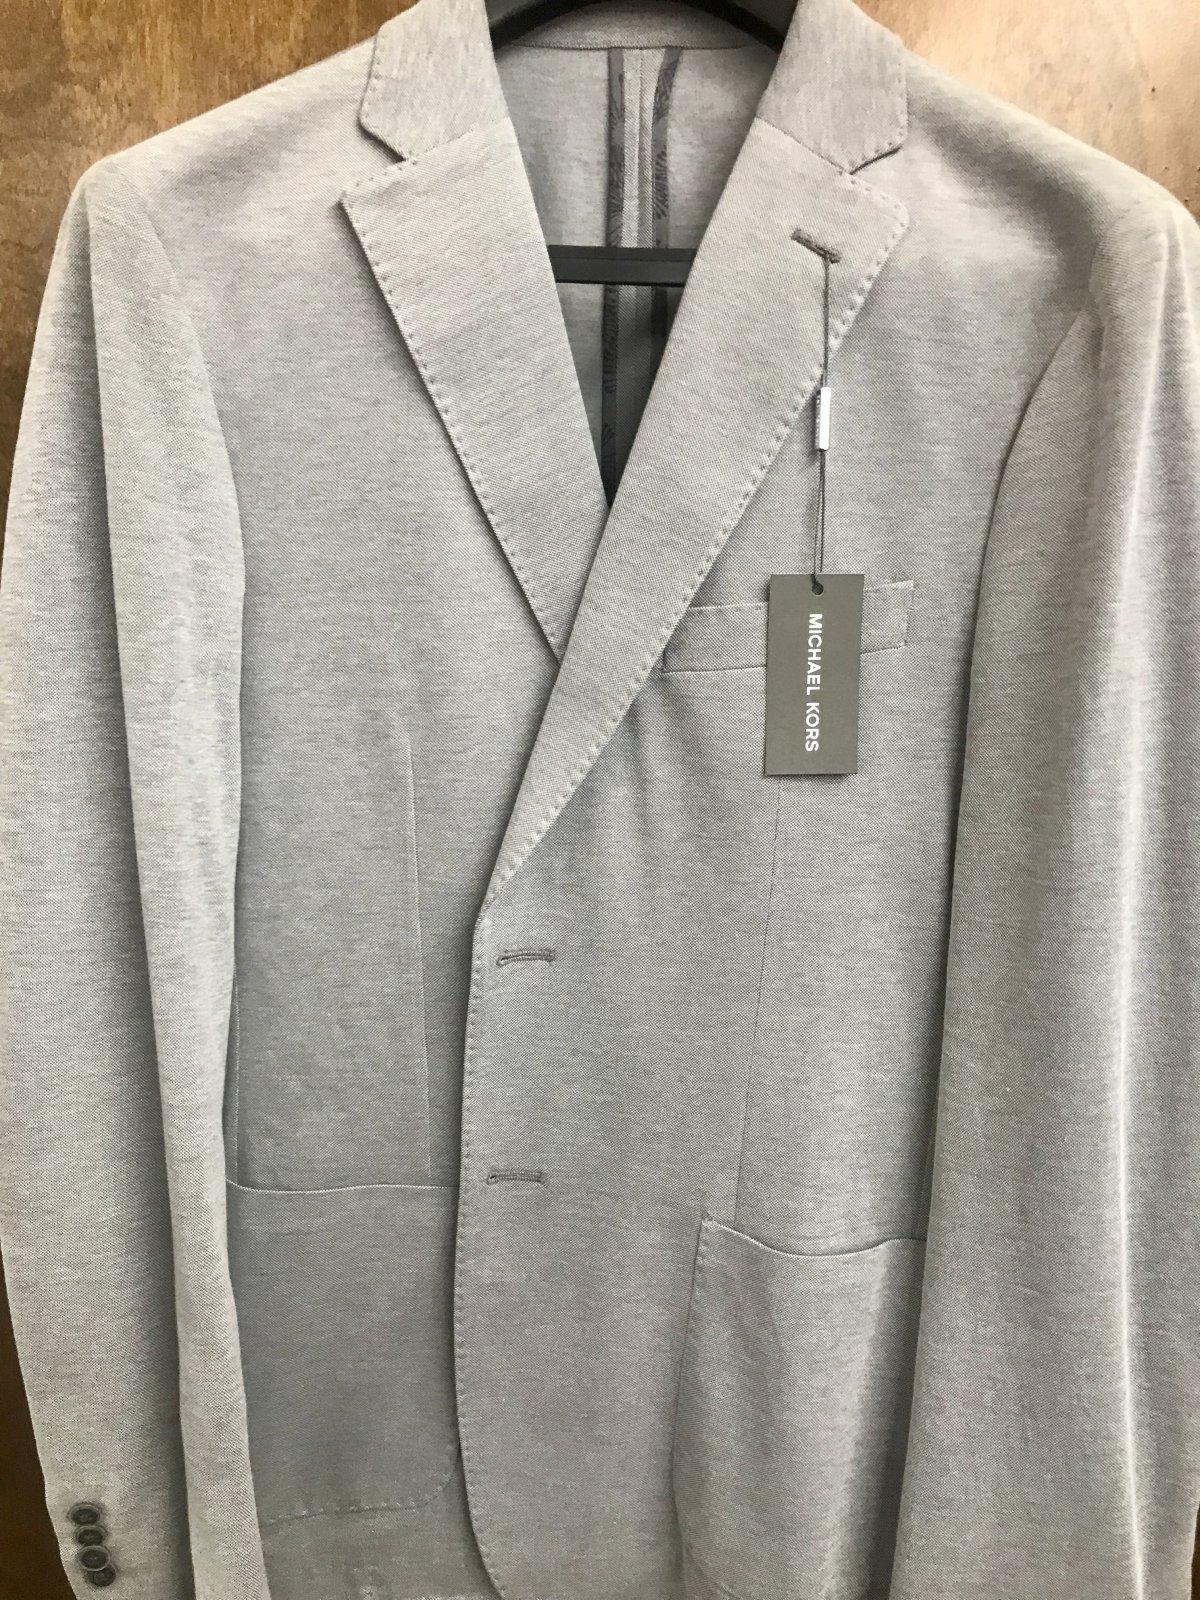 Michael Kors Soft Coat KVY0031